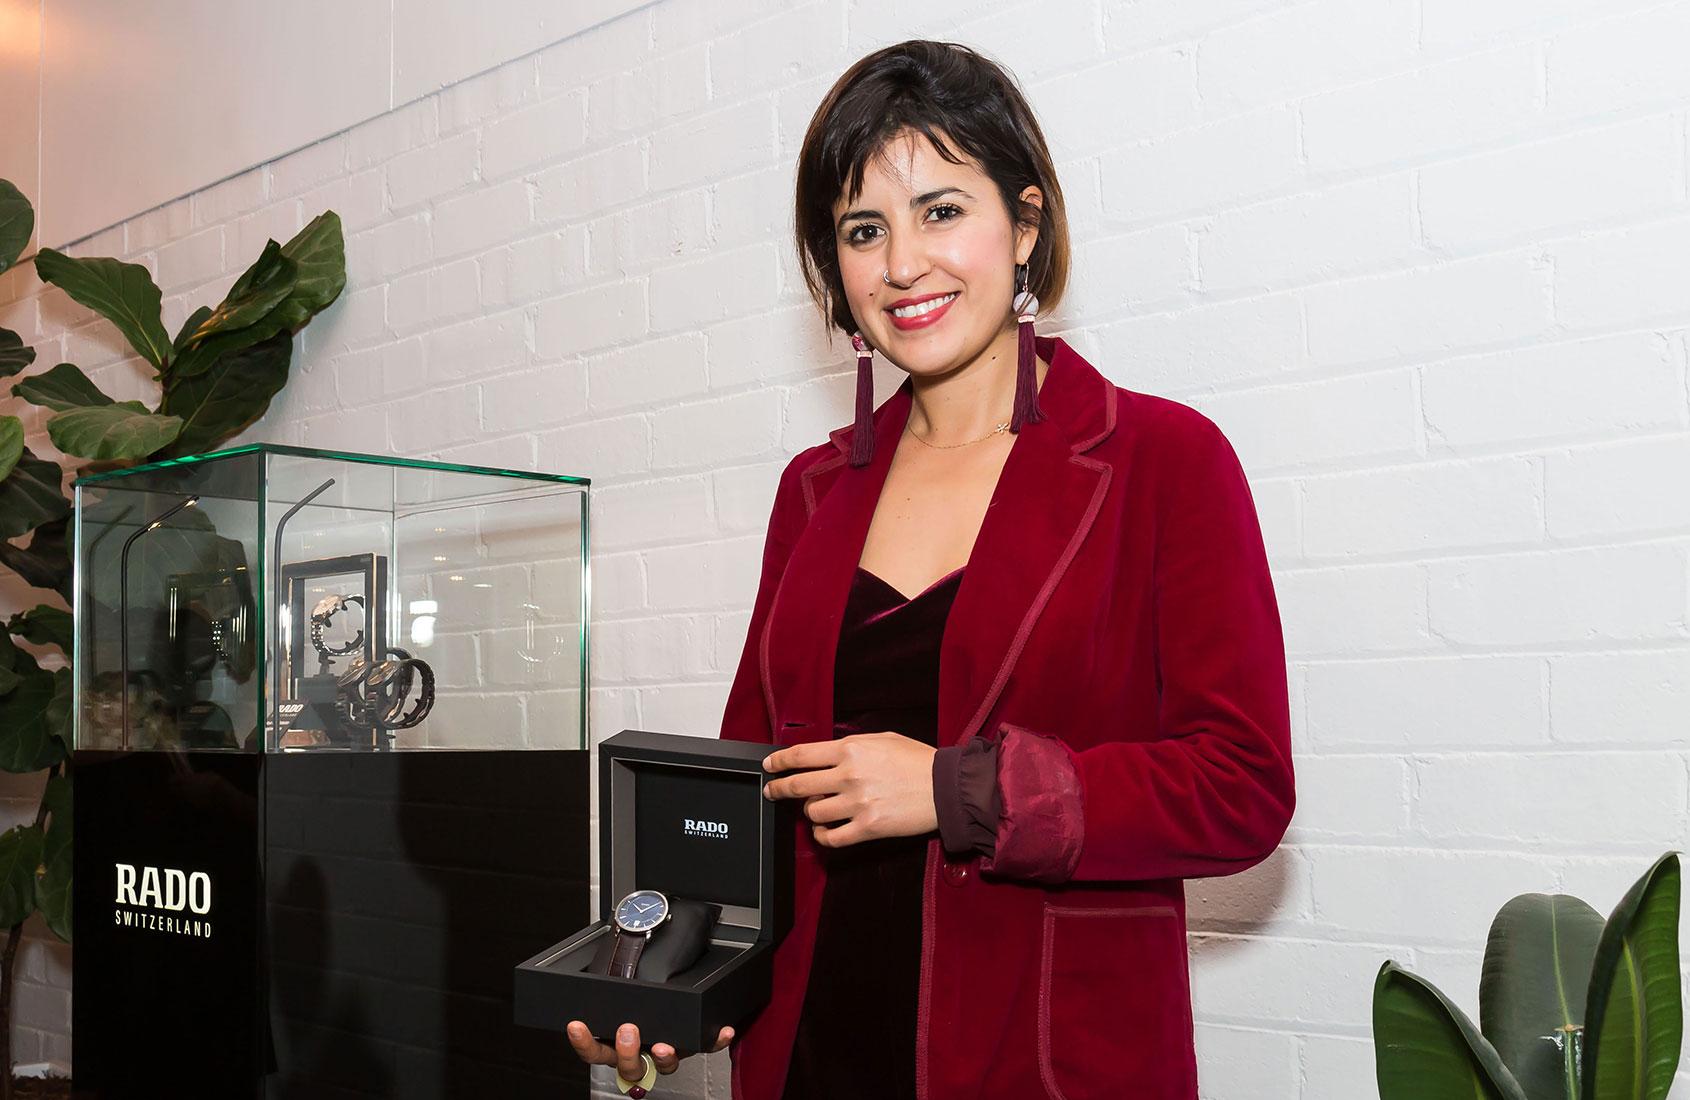 Yasmine Ghoniem Winner Of The Rado Emerging Design Star Award